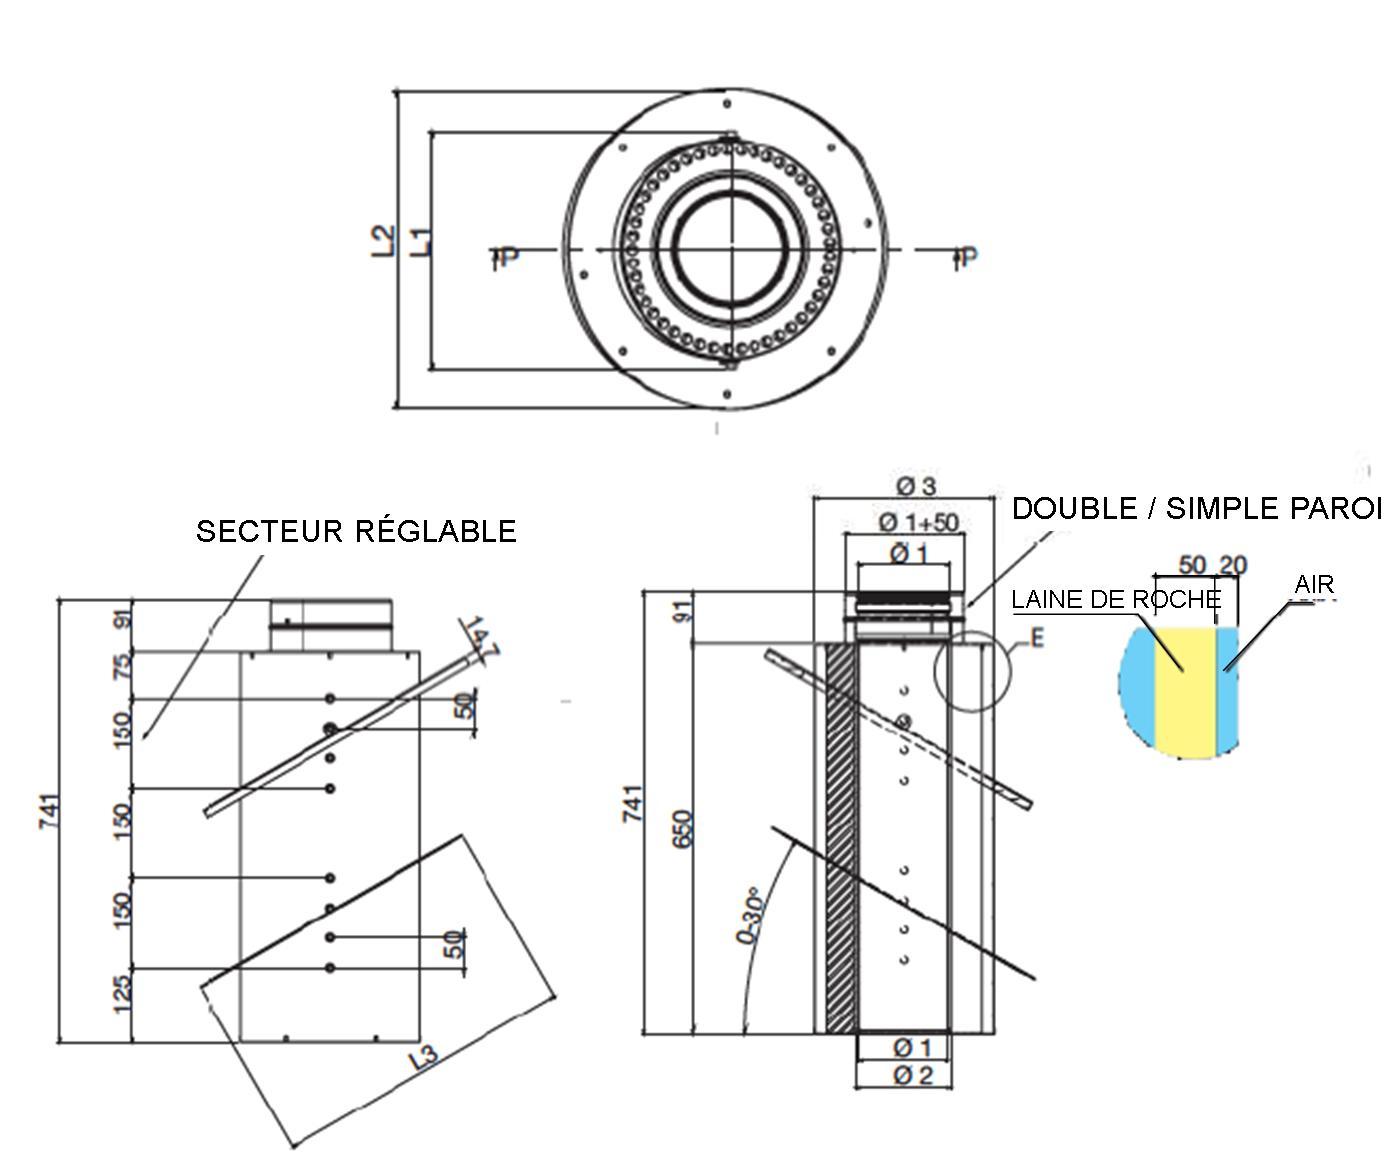 travers isol pour toiture en bois 200mm r f. Black Bedroom Furniture Sets. Home Design Ideas